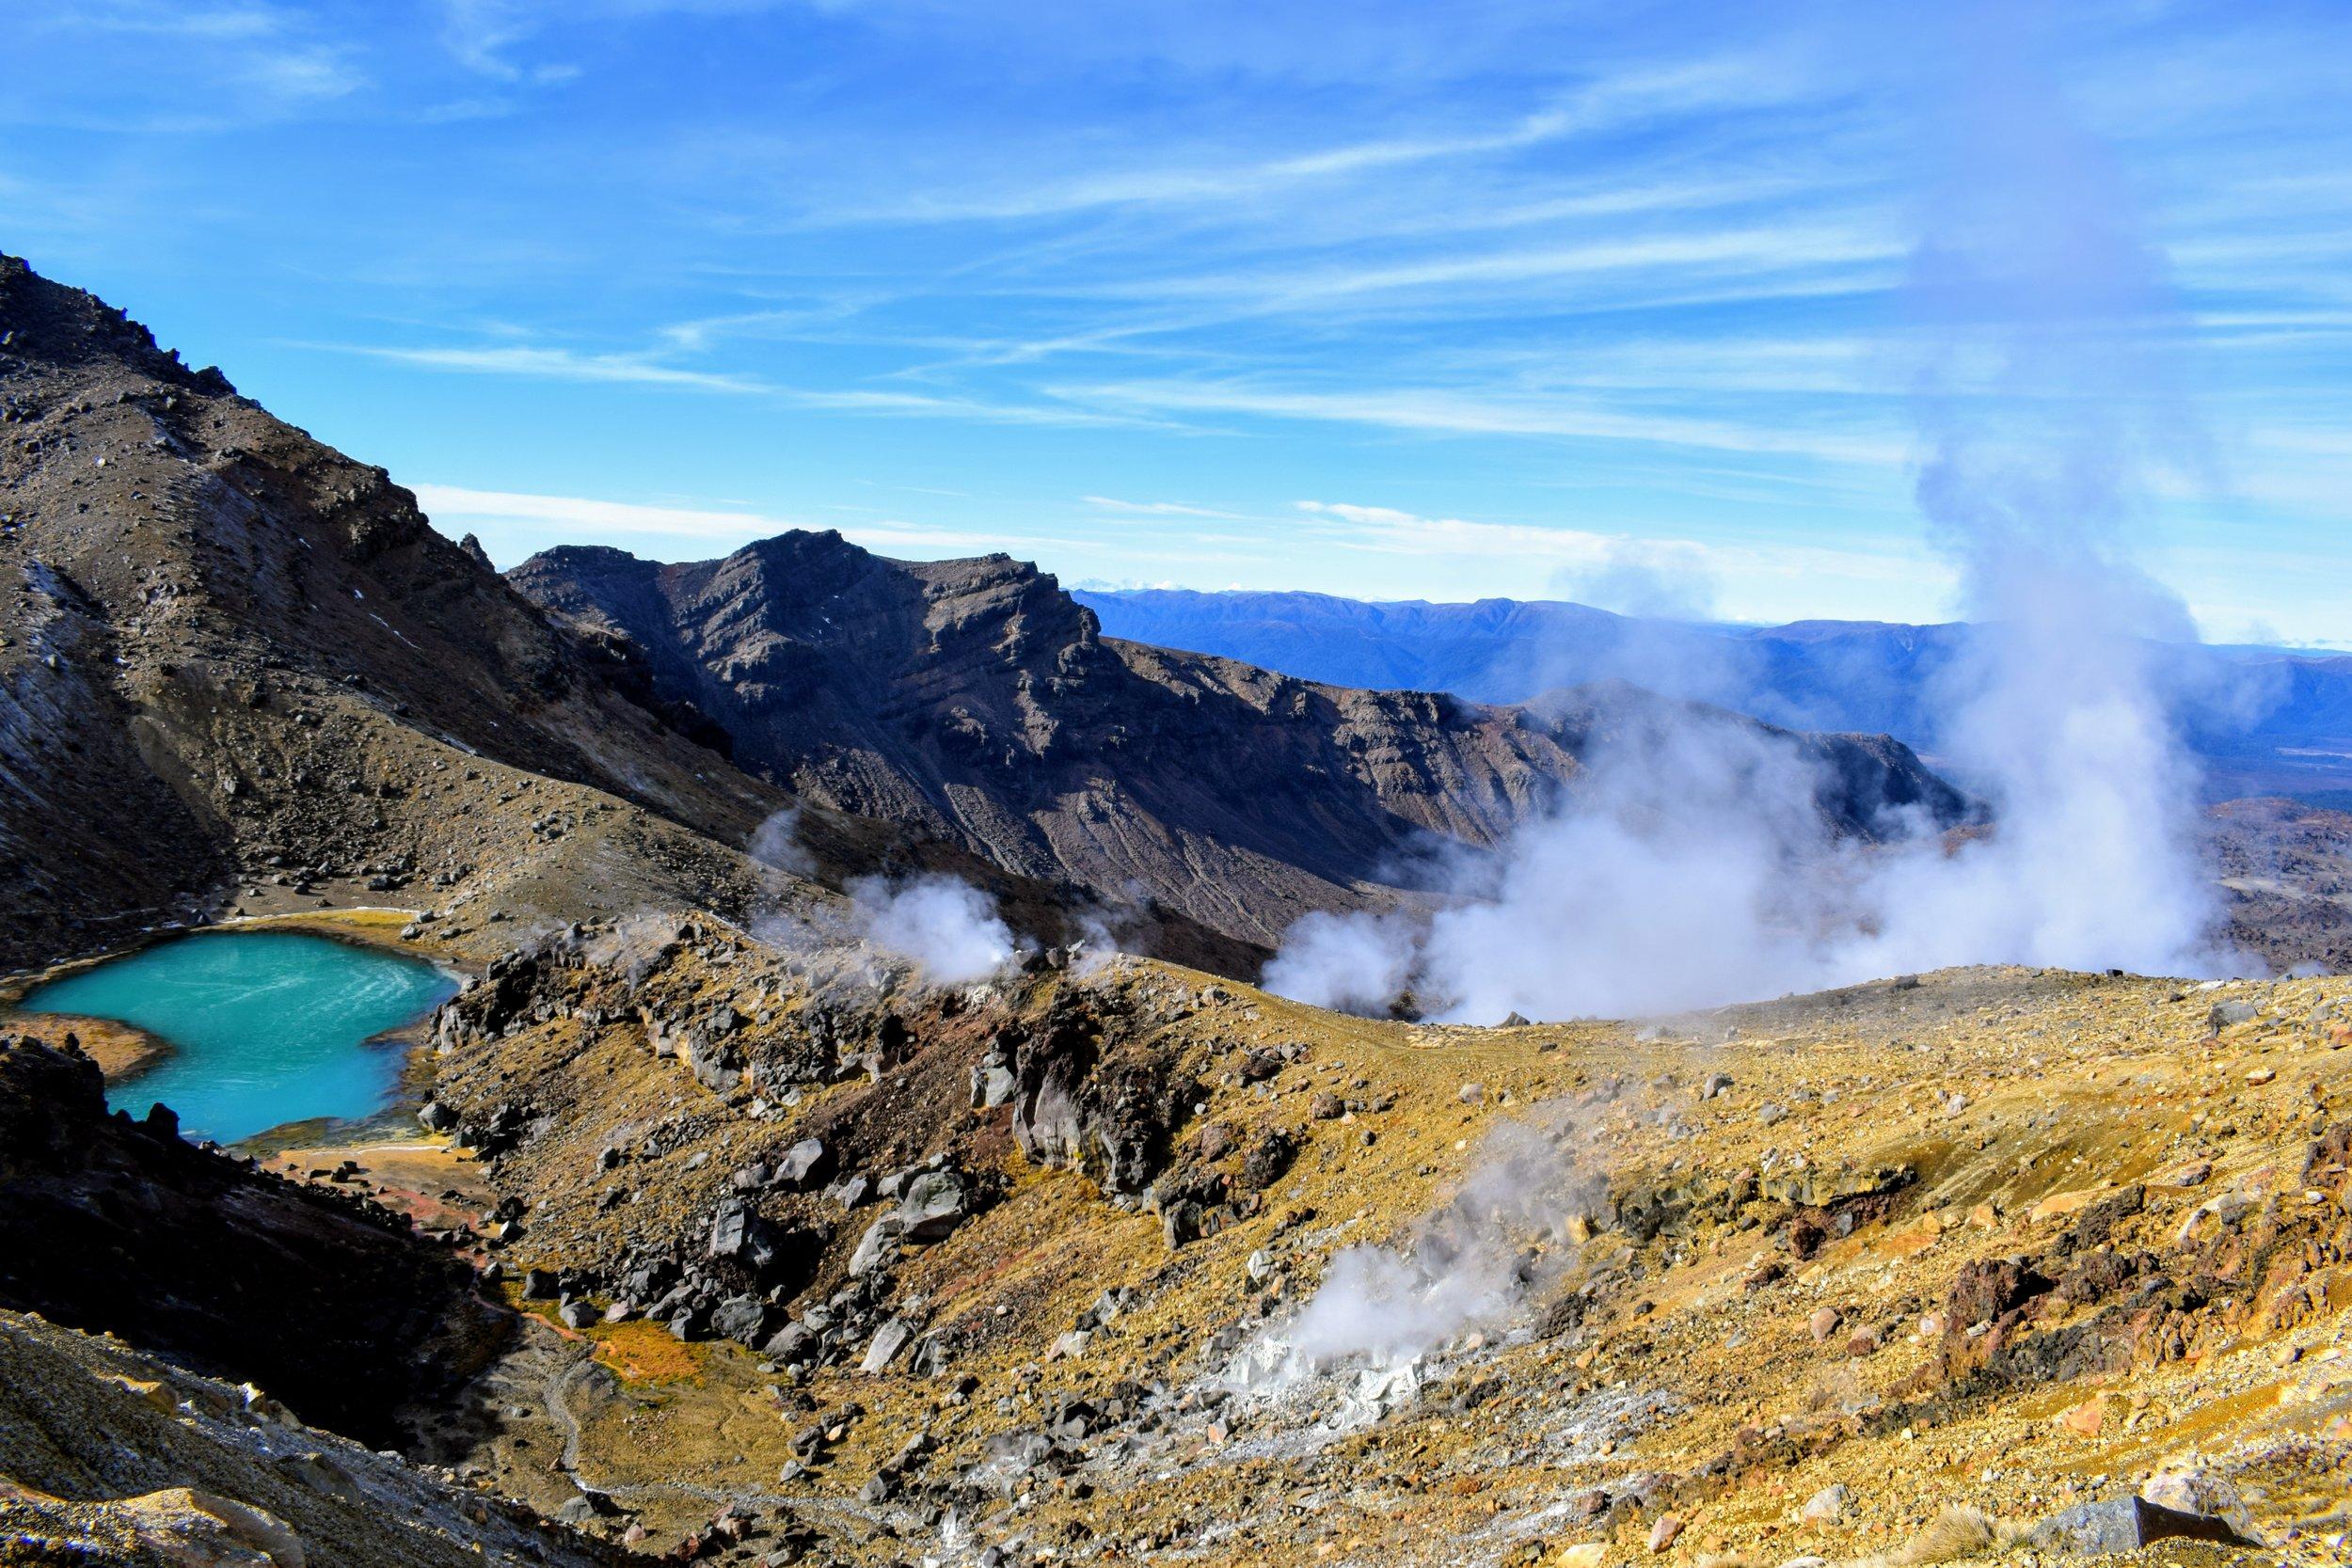 Ya gotta love that surreal volcanic terrain.